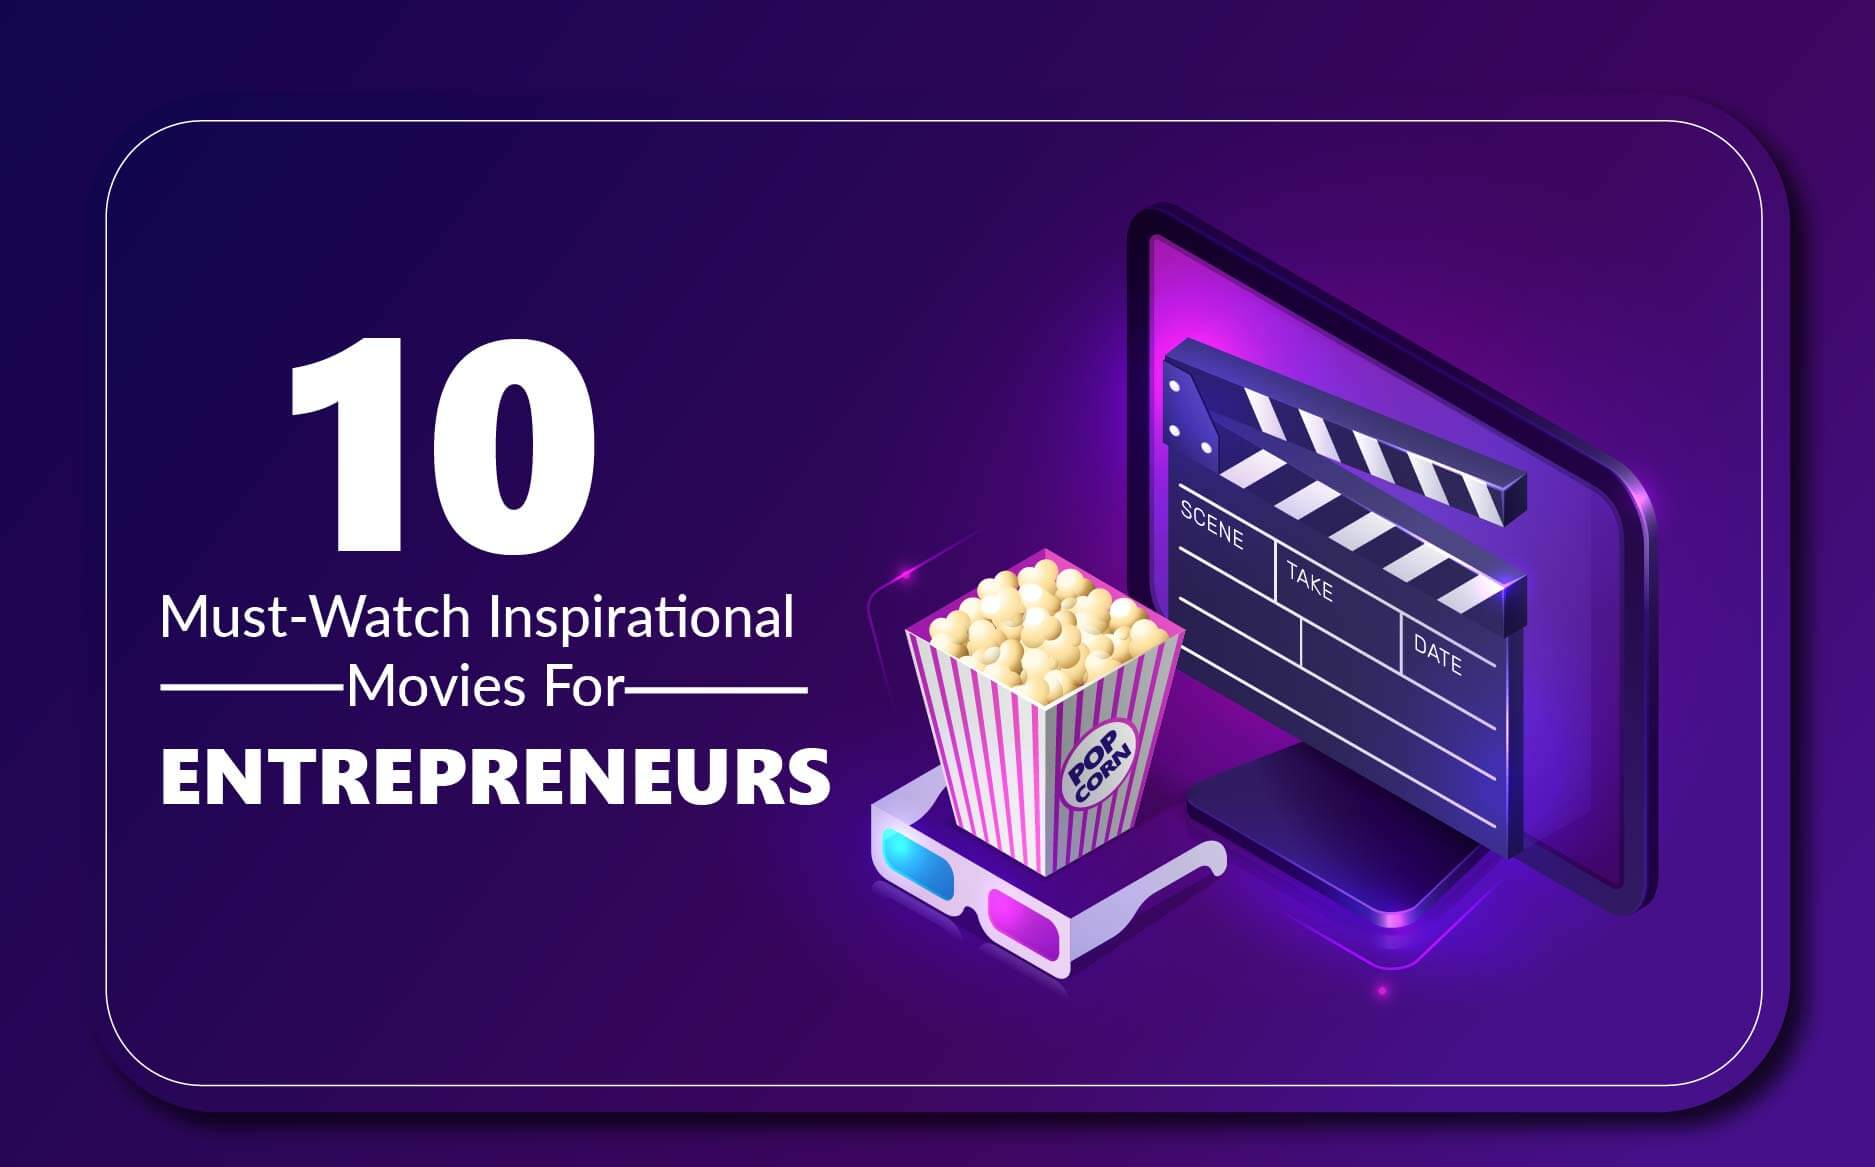 Inspirational Movies For Entrepreneurs